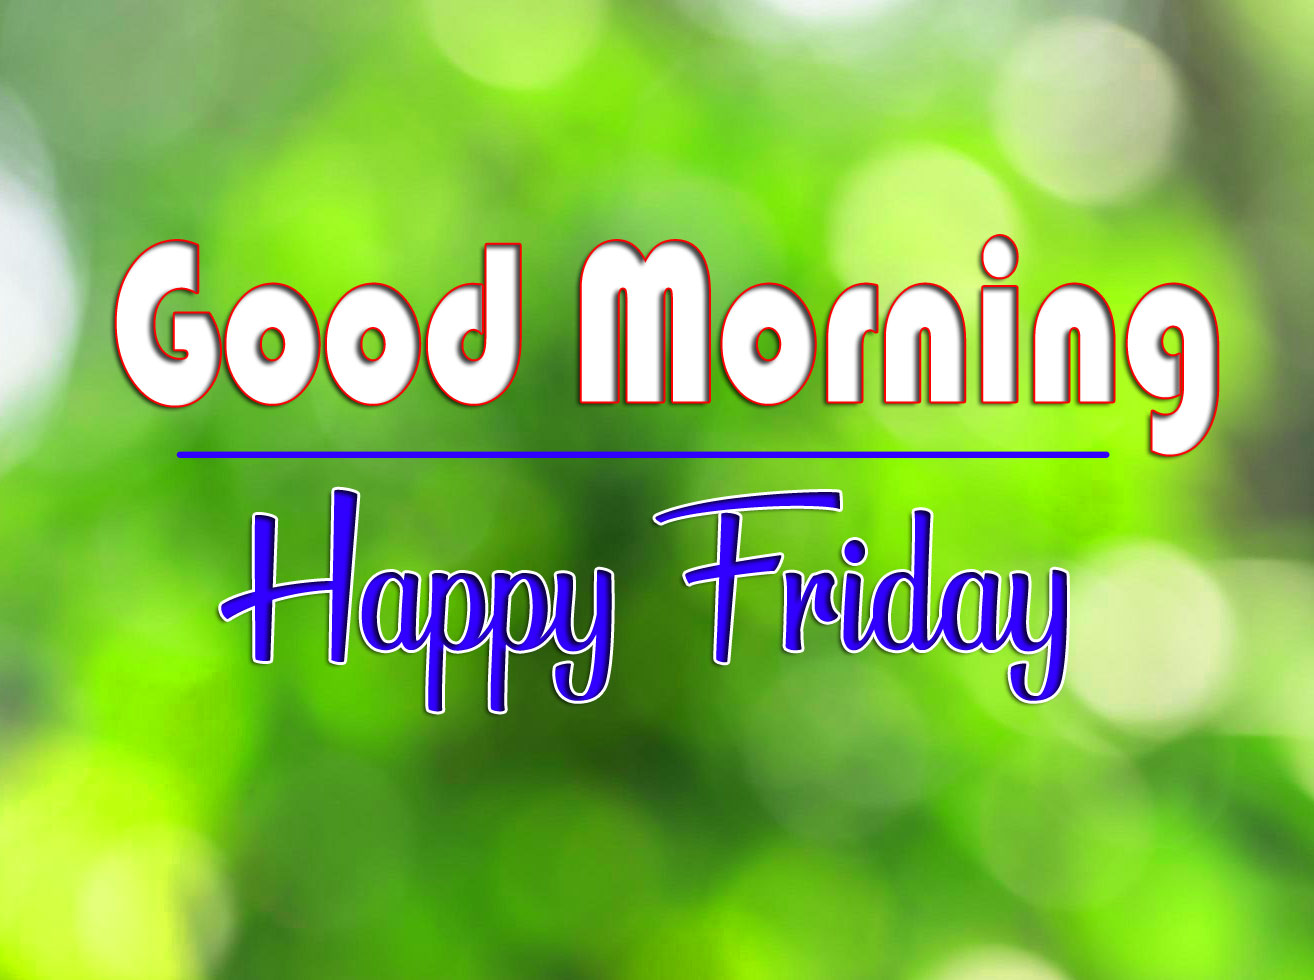 friday Good morning Pics Download Free